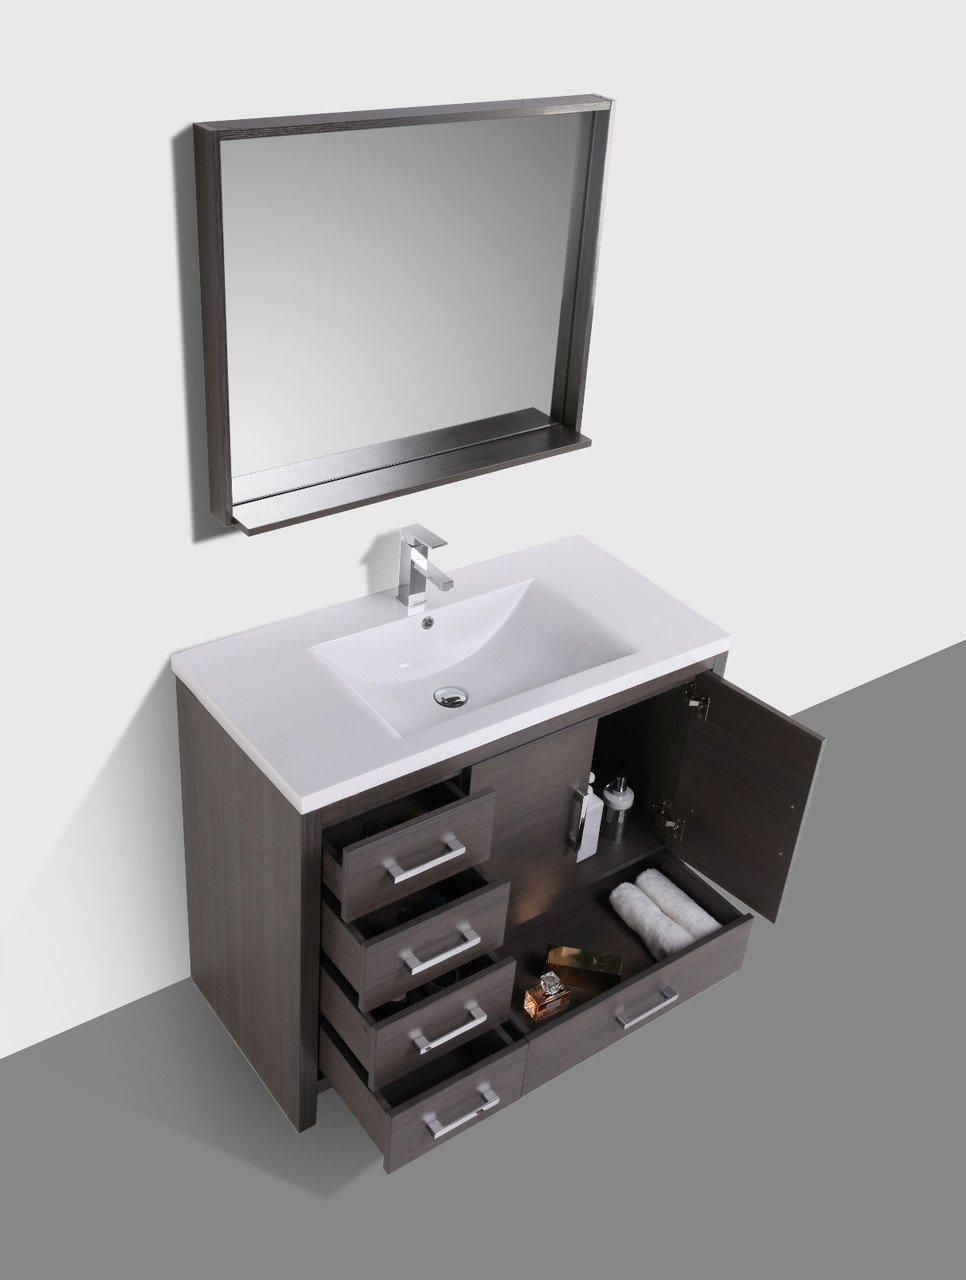 Moreno moa 42 gray oak modern bathroom vanity white - Small bathroom vanity with drawers ...